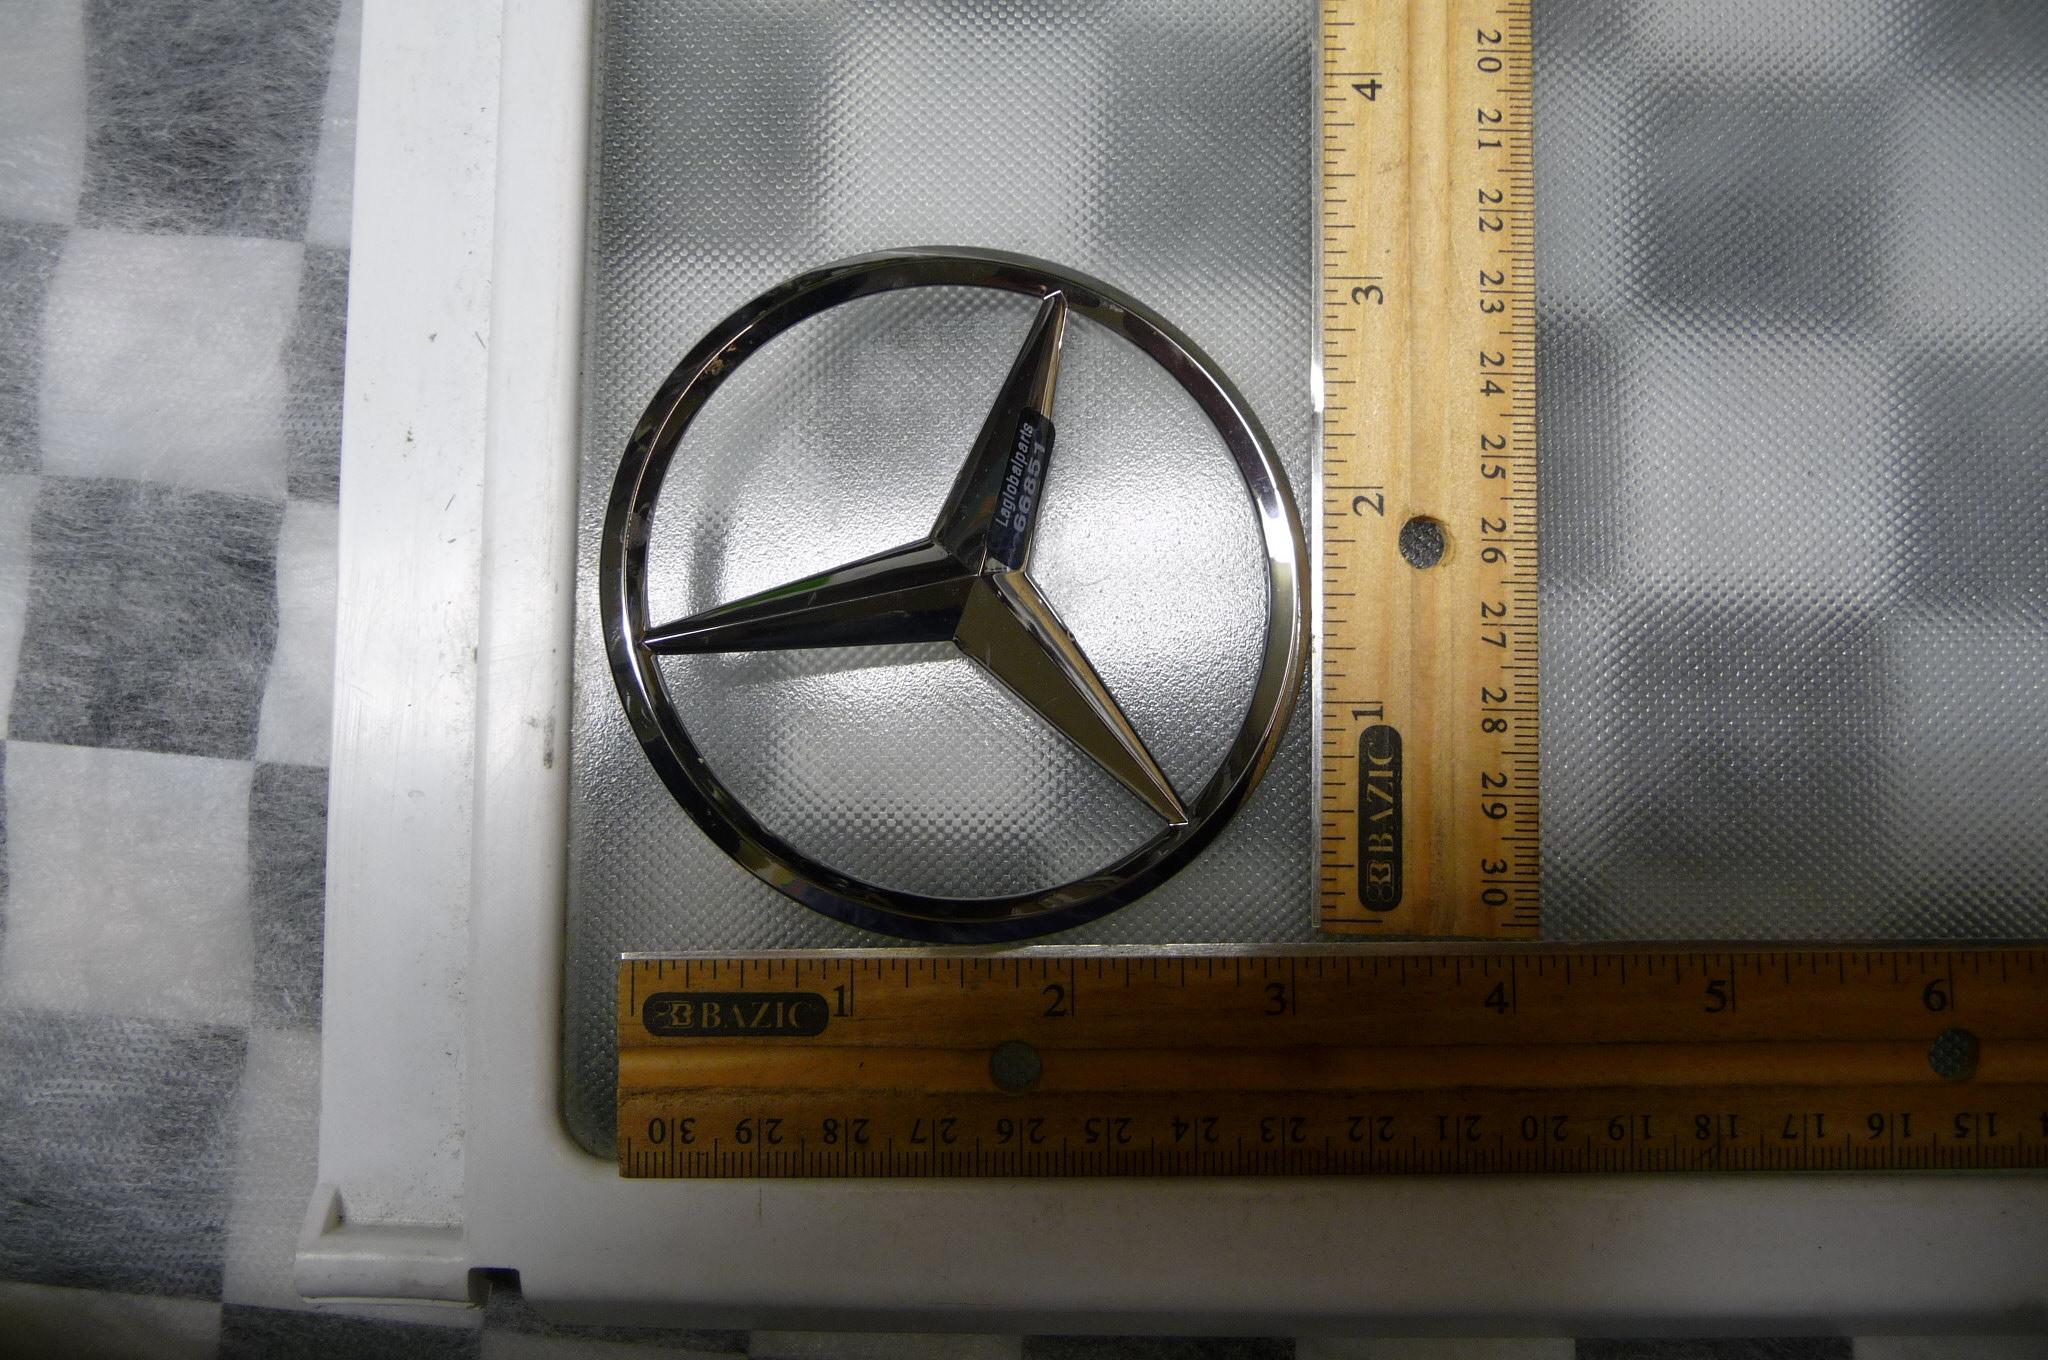 Mercedes Benz W205 C Class Trunk Lid Emblem Badge Nameplate 2058174500 OEM